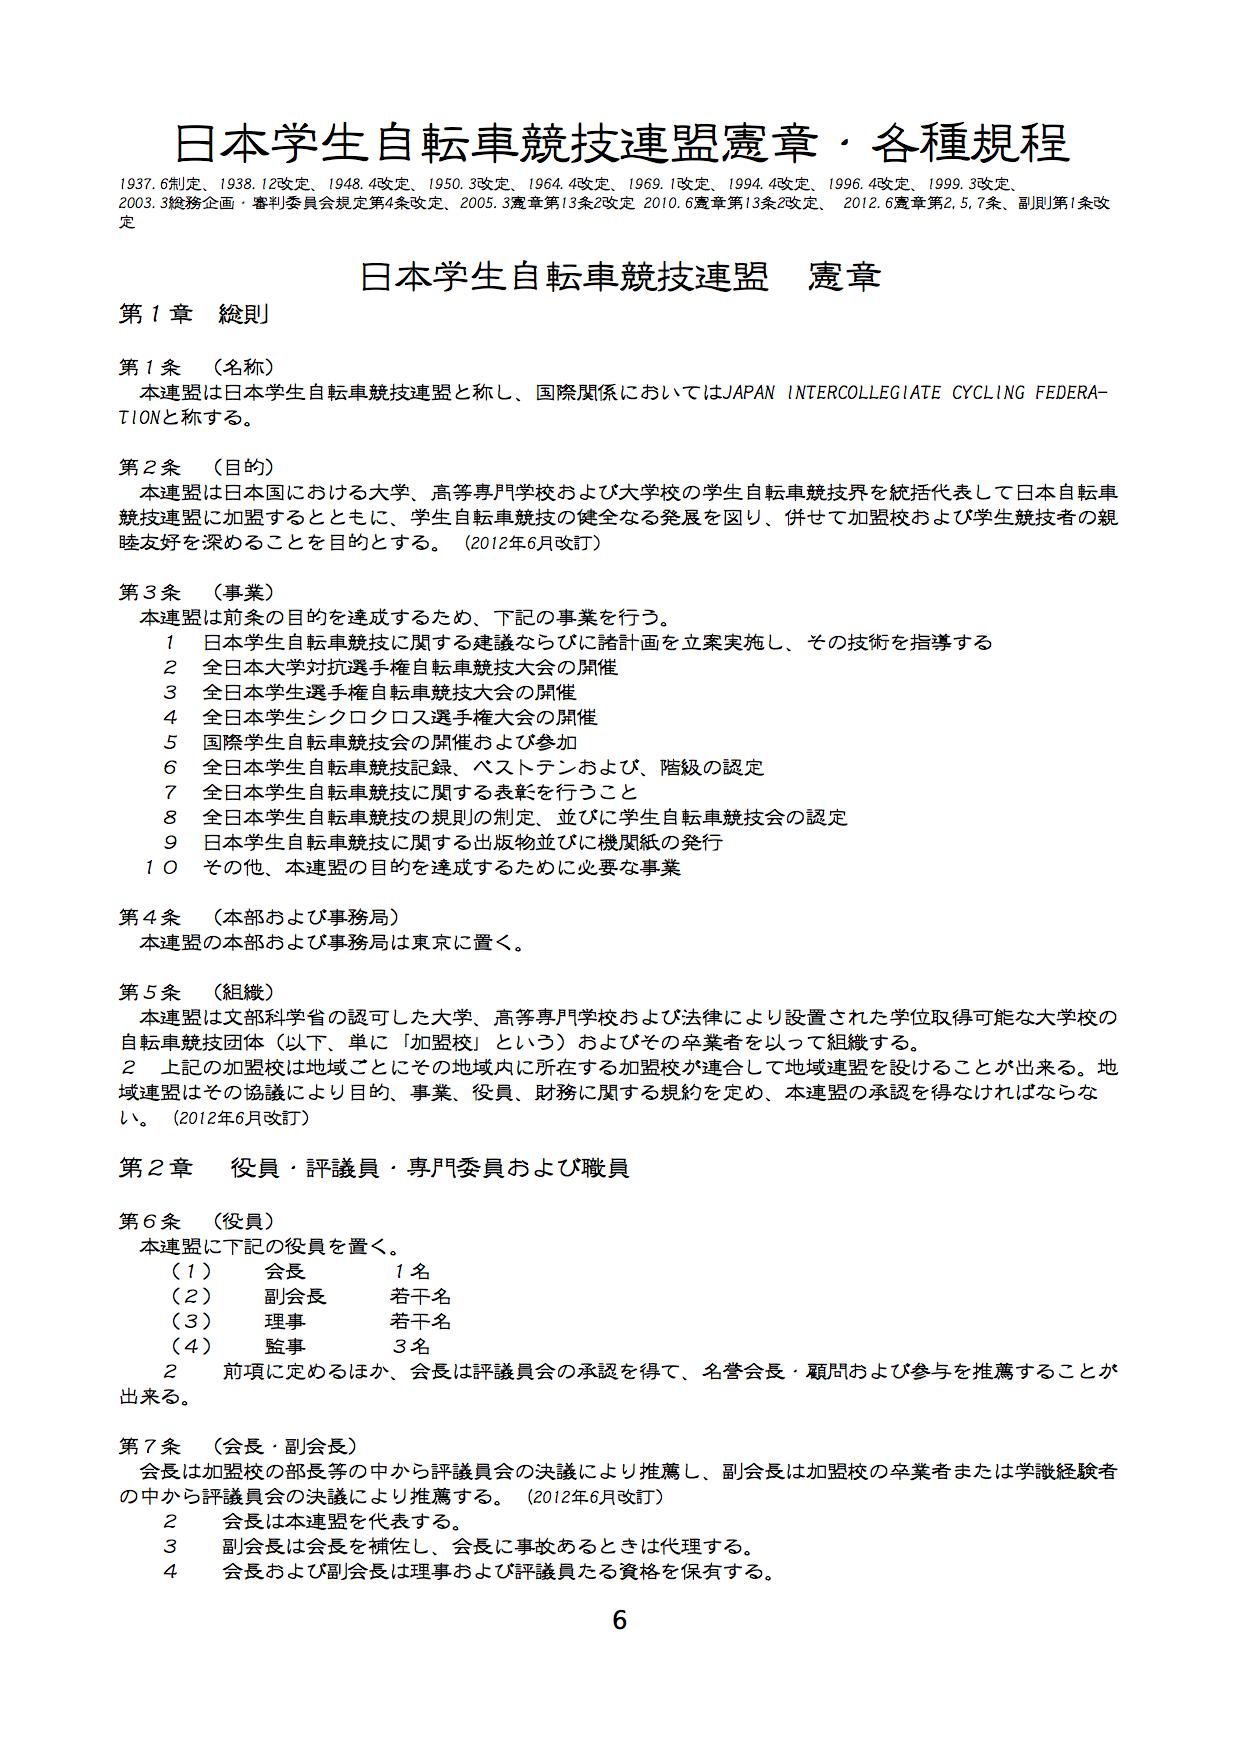 15jicf_gakuren_annai_150621_jicf_kensho_00001